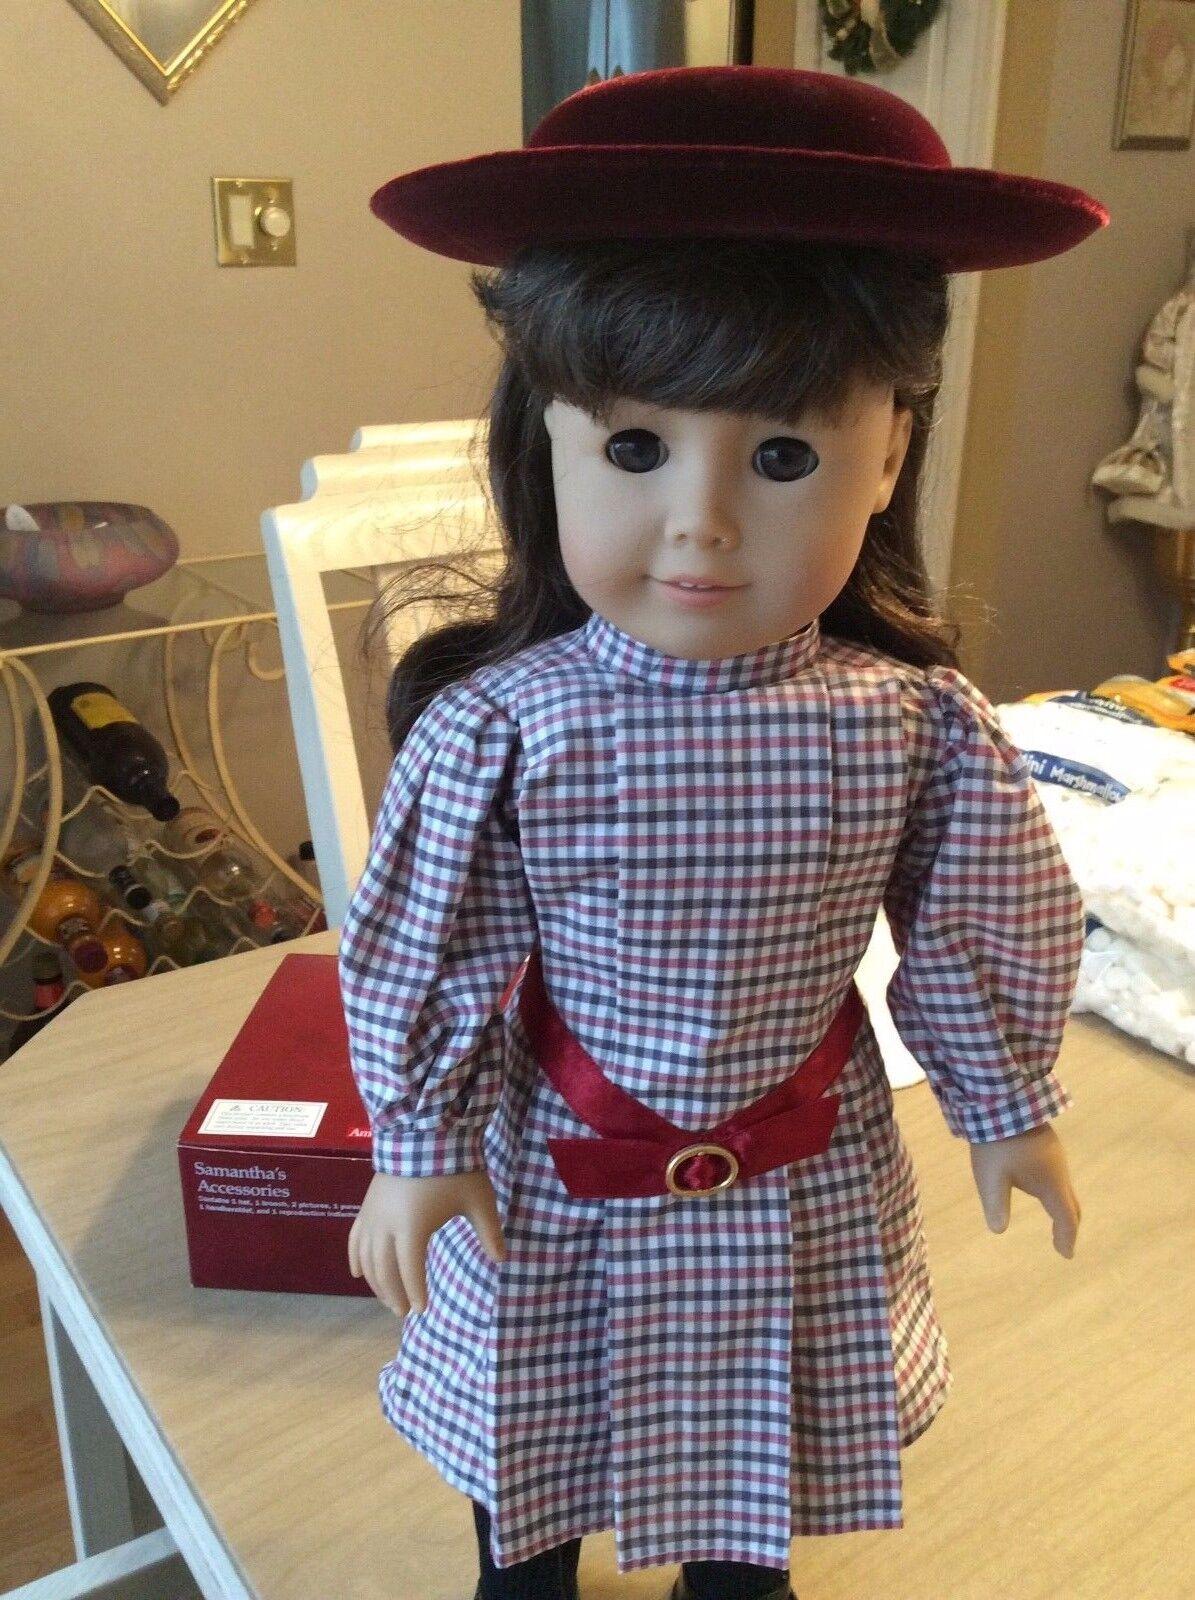 Pleasant Company American Girl Doll, Samantha Parkington, Doll with hat no box